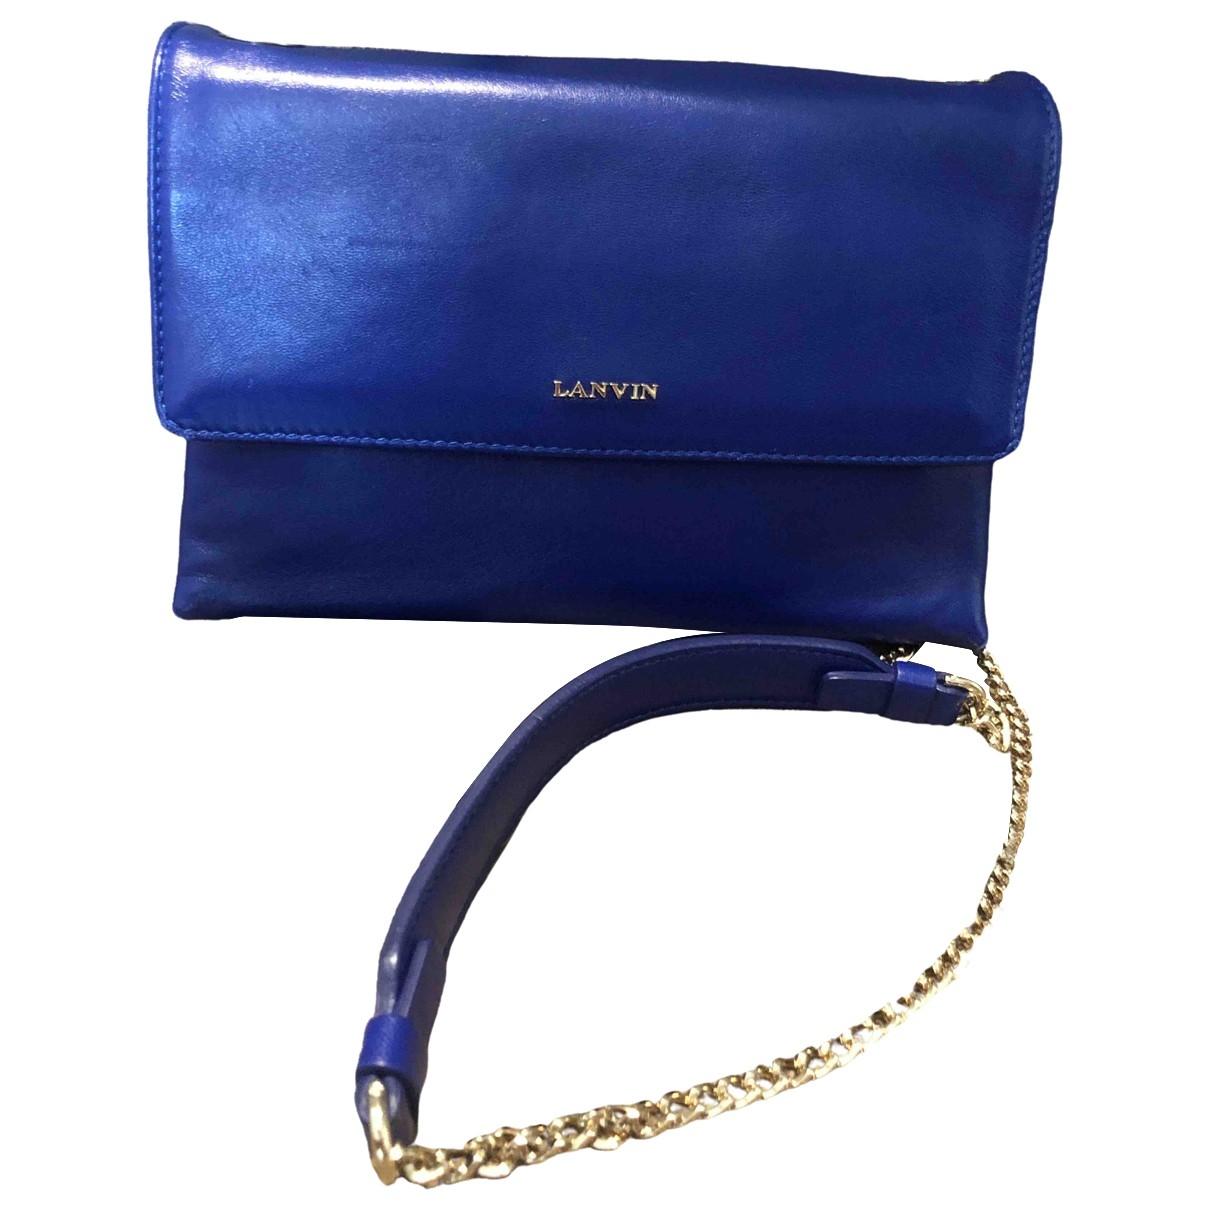 Lanvin \N Blue Leather Clutch bag for Women \N